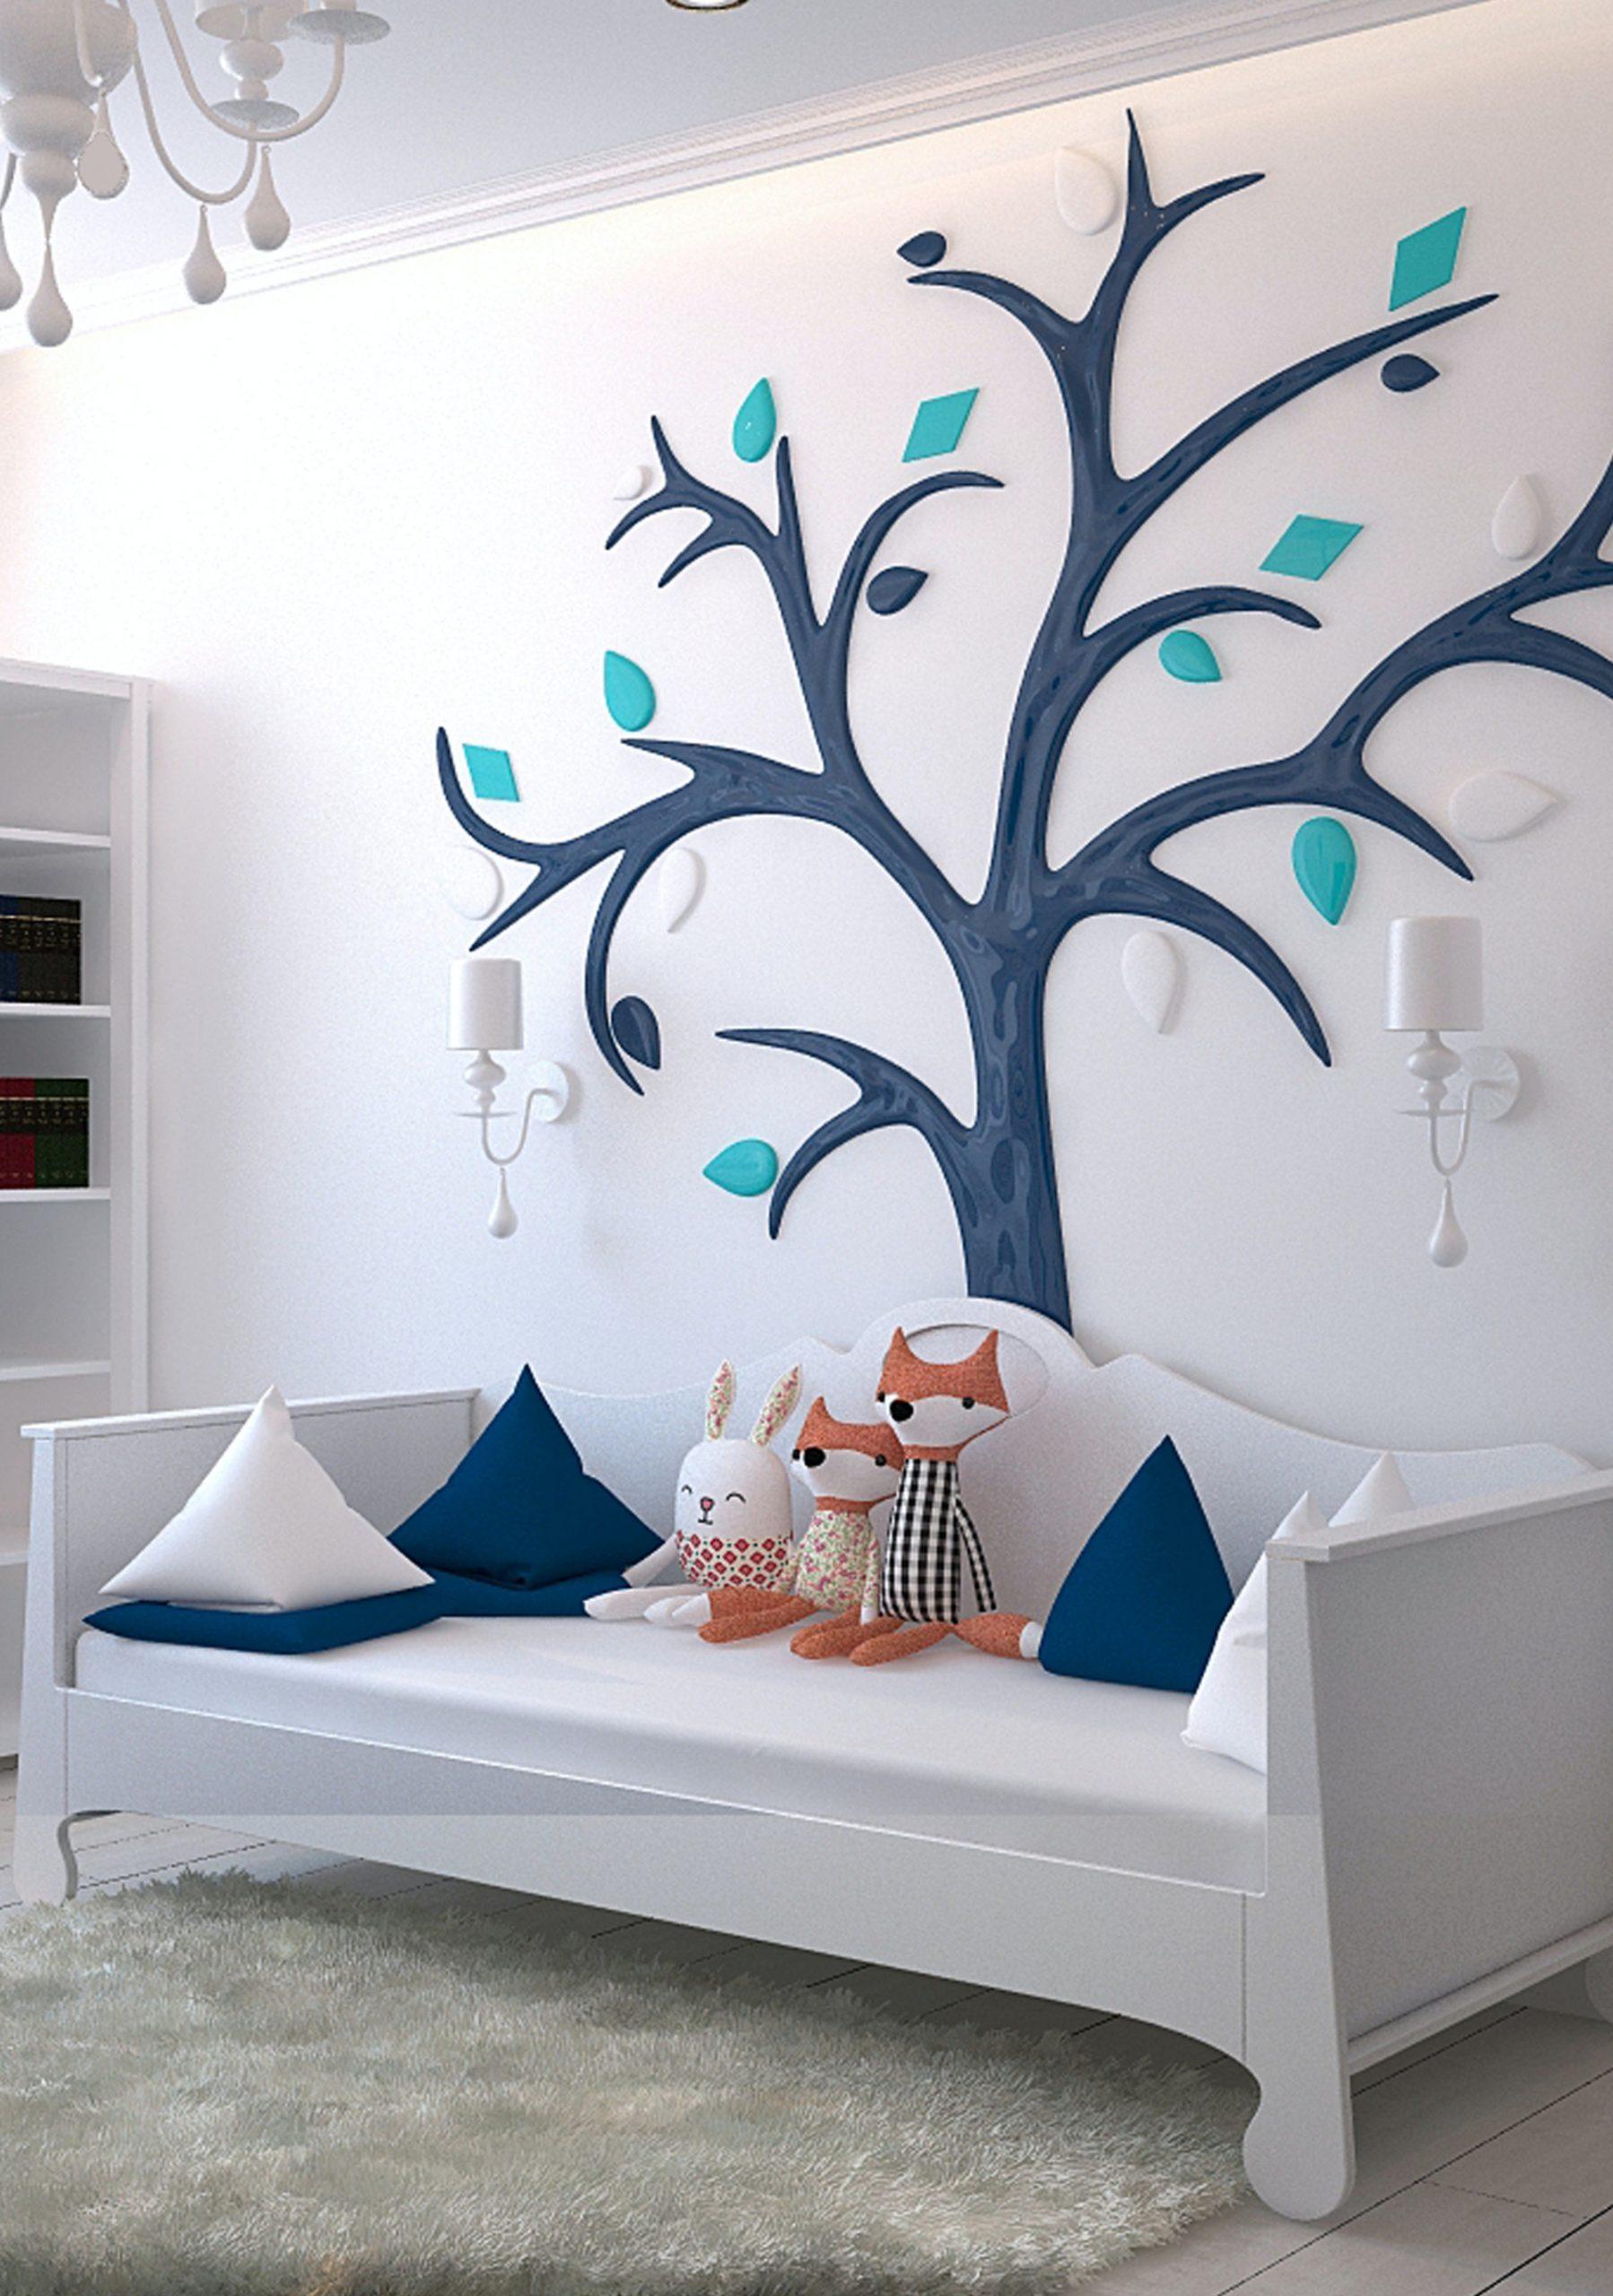 dormitorio-infantil-virtual-home-staging-neutral-decor-2